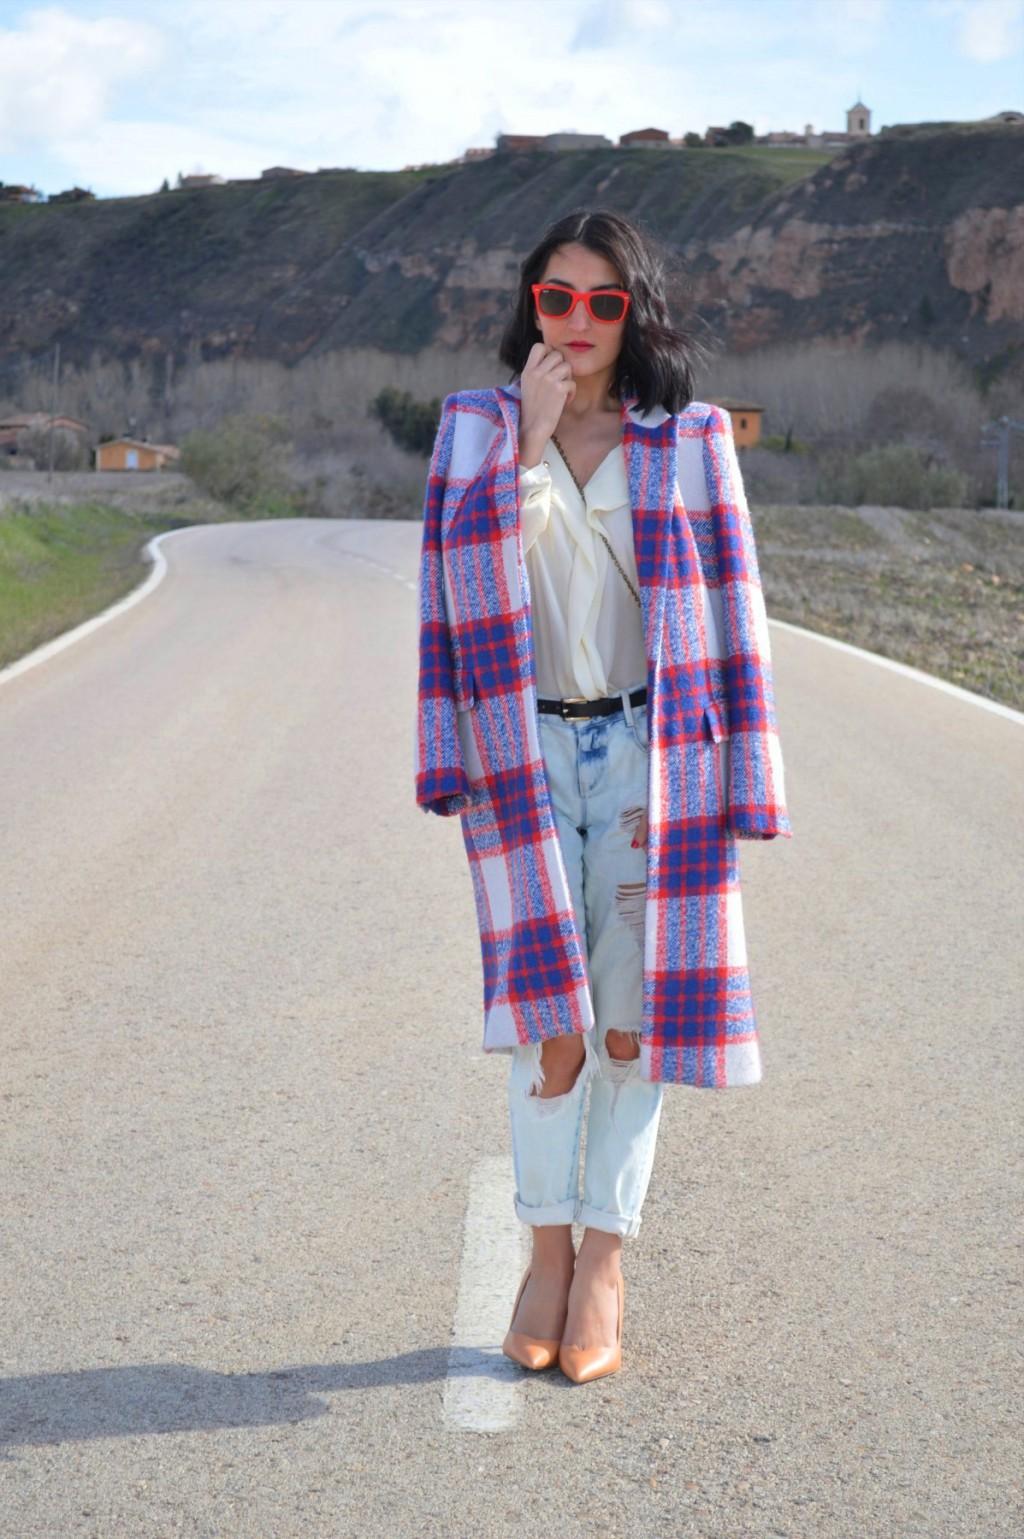 Abrigo / coat: Zara (new) boyfriend jeans / Stilettos: Zara Blusa / blouse: Sfera (old) Bolso / bag: Massimo dutti (old) Gafas de sol / sunglasses: Ray ban wayfarer Cinturón / belt: vintage